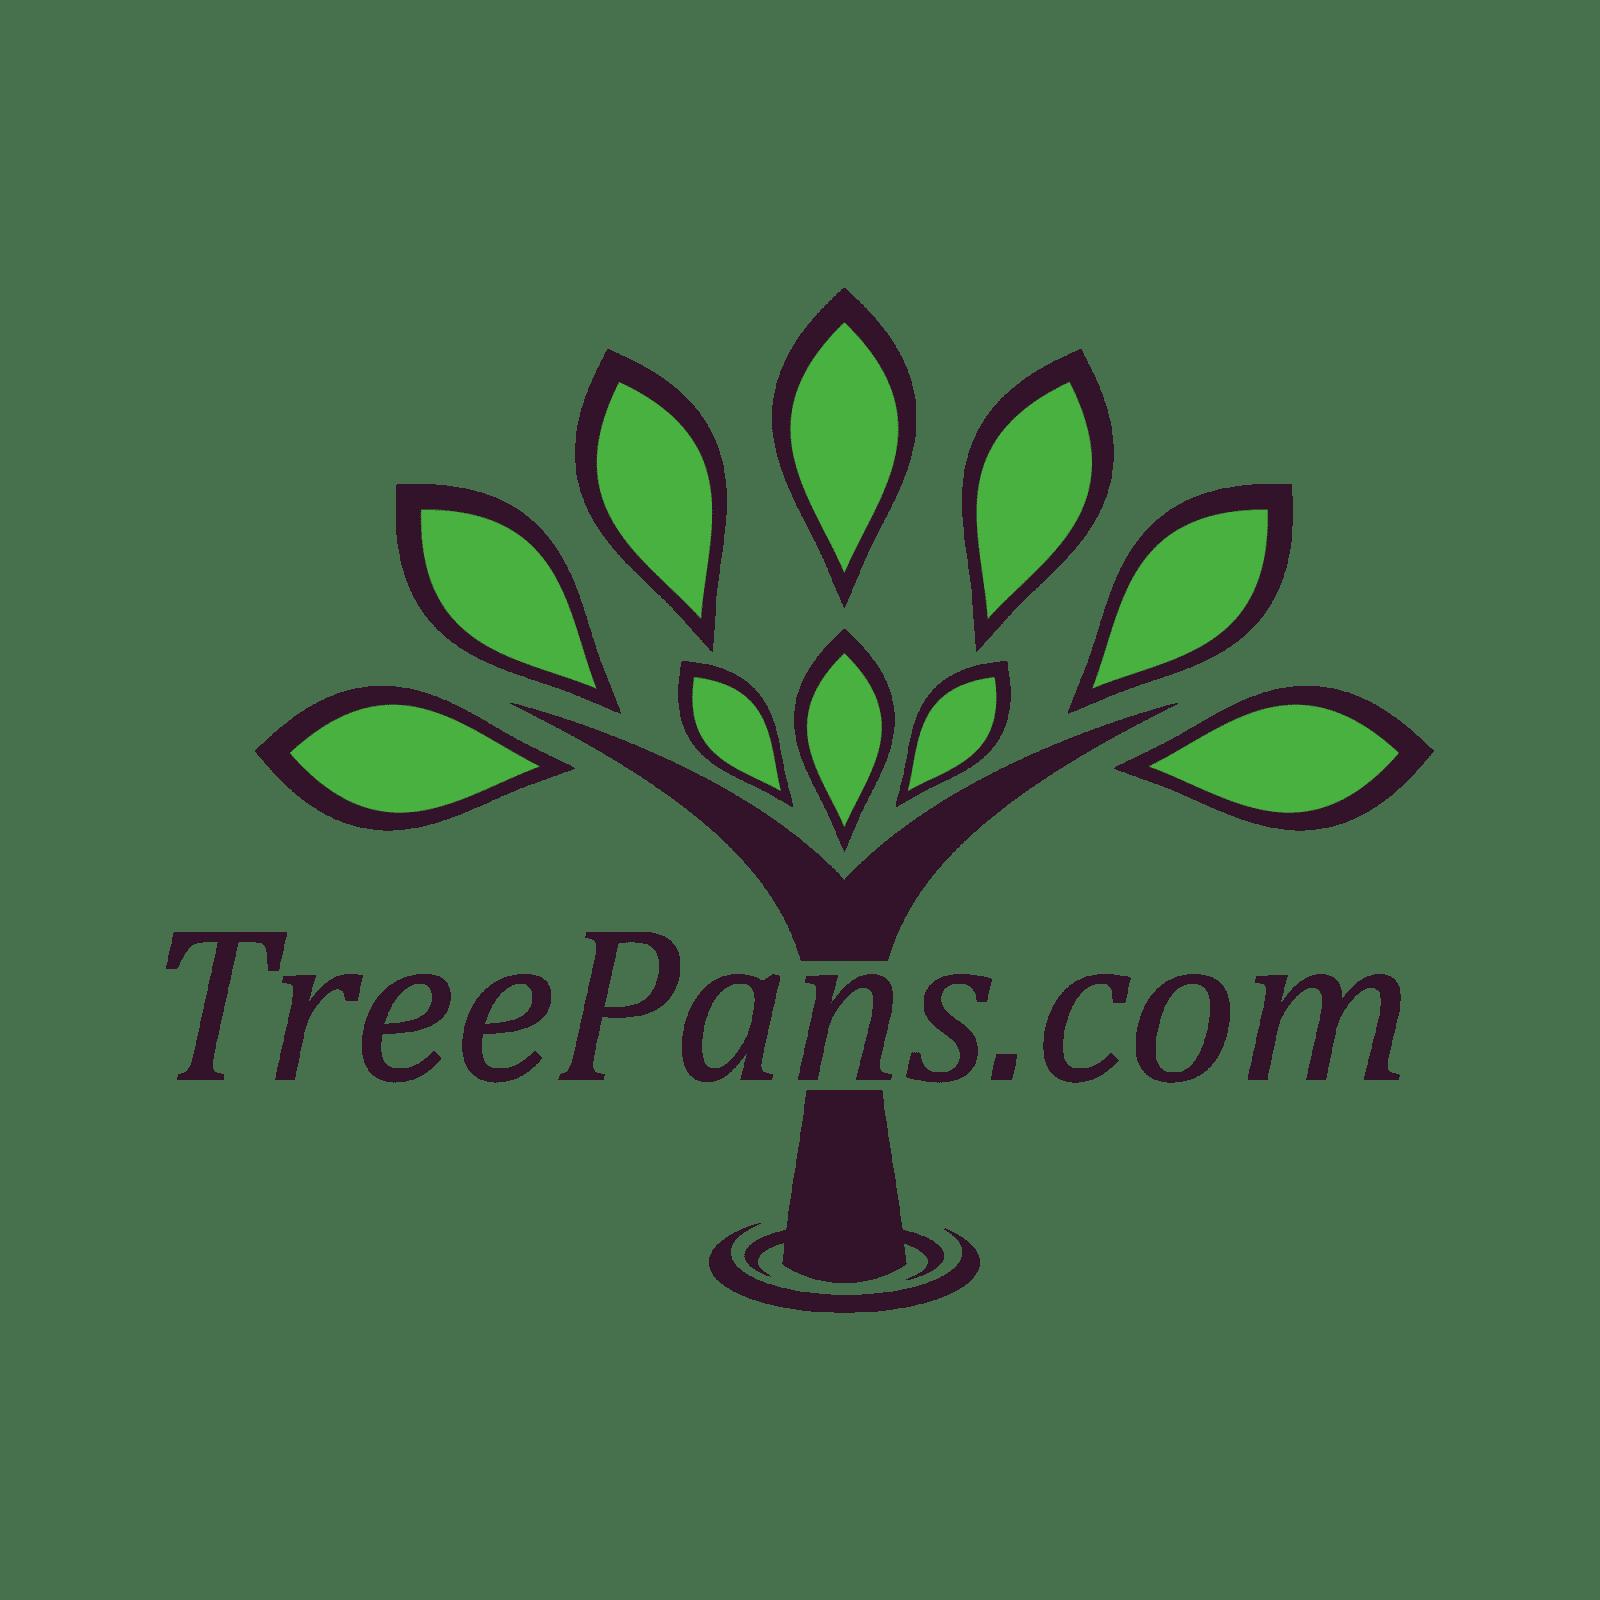 Treepans Logo